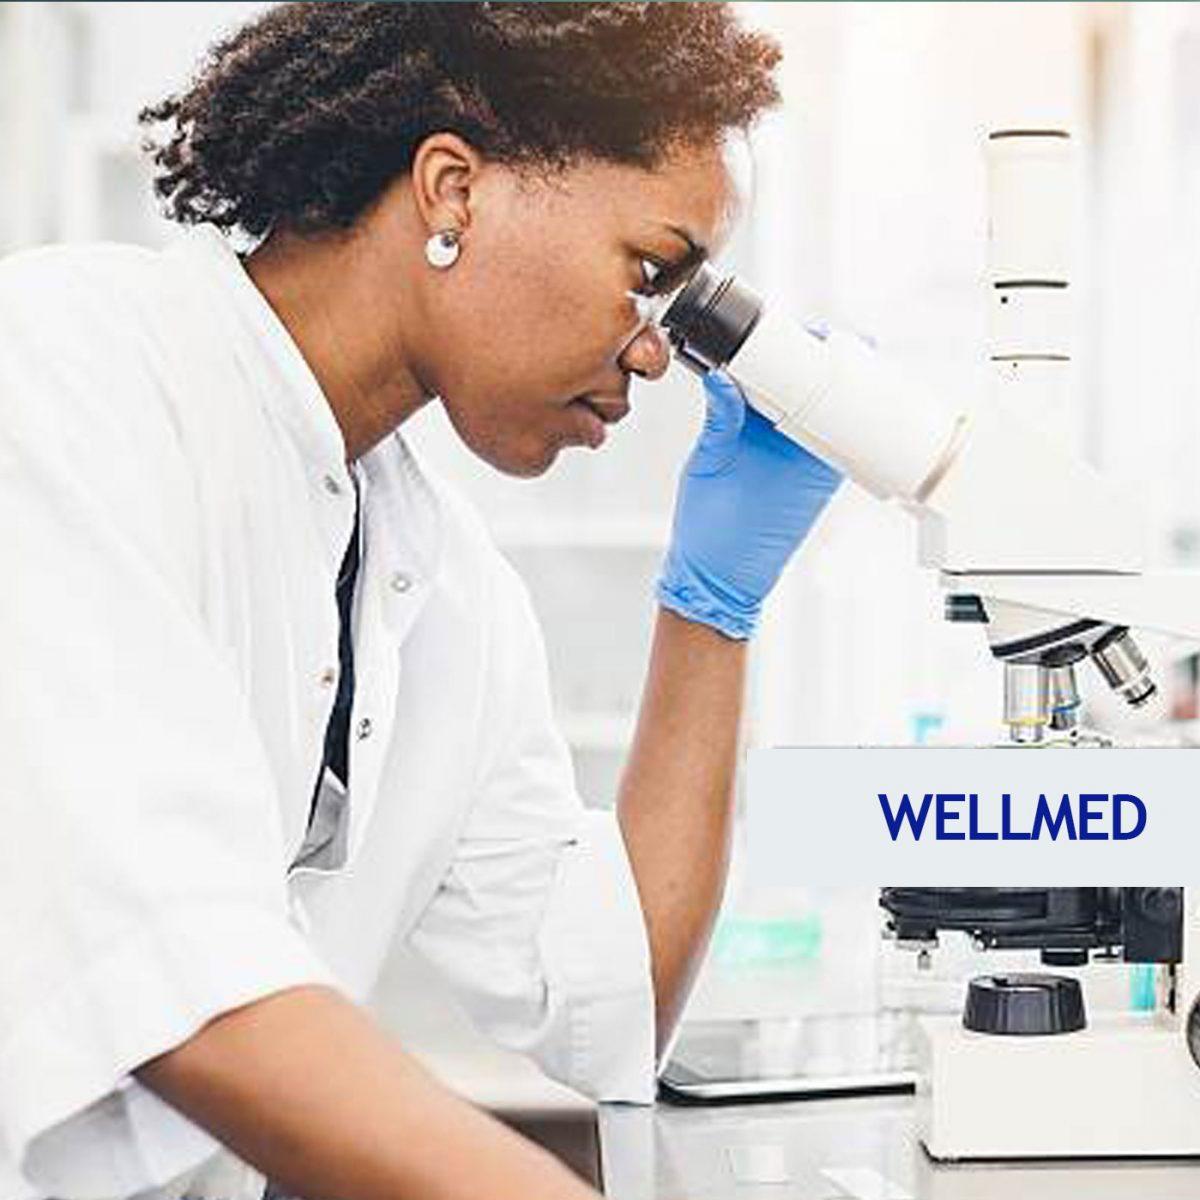 WellMed_Lab-1200x1200.jpg